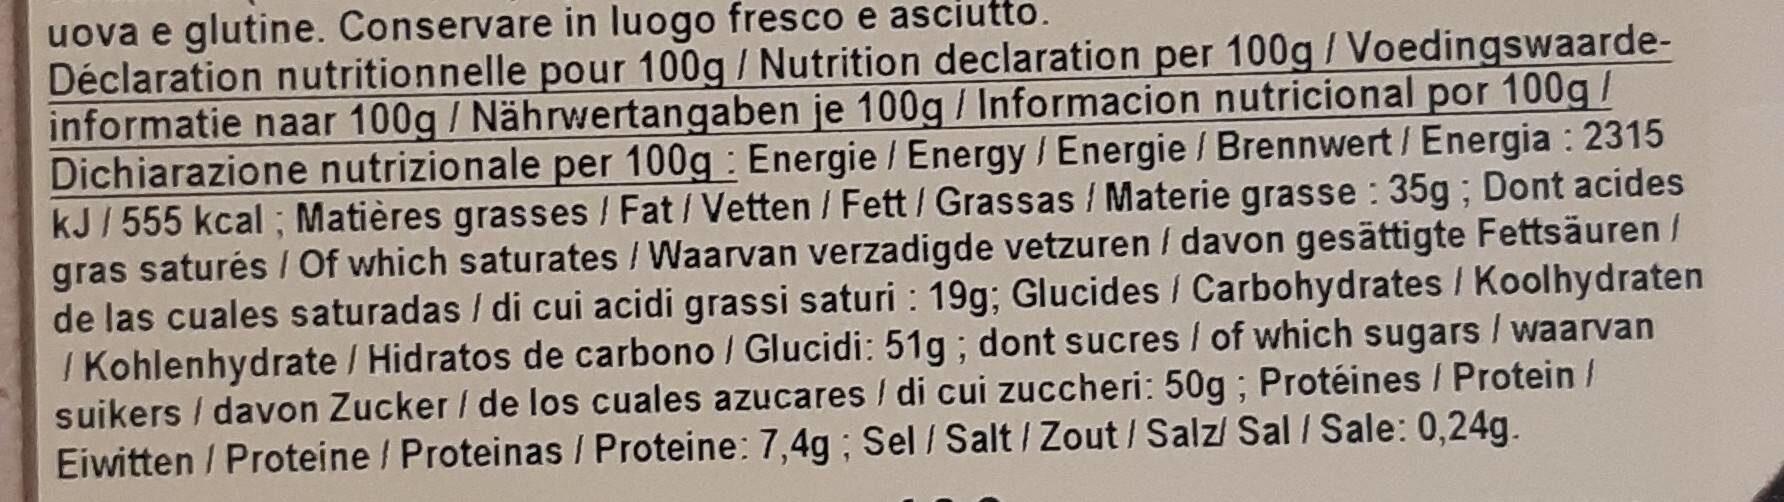 Chocolat à casser - Nutrition facts - fr